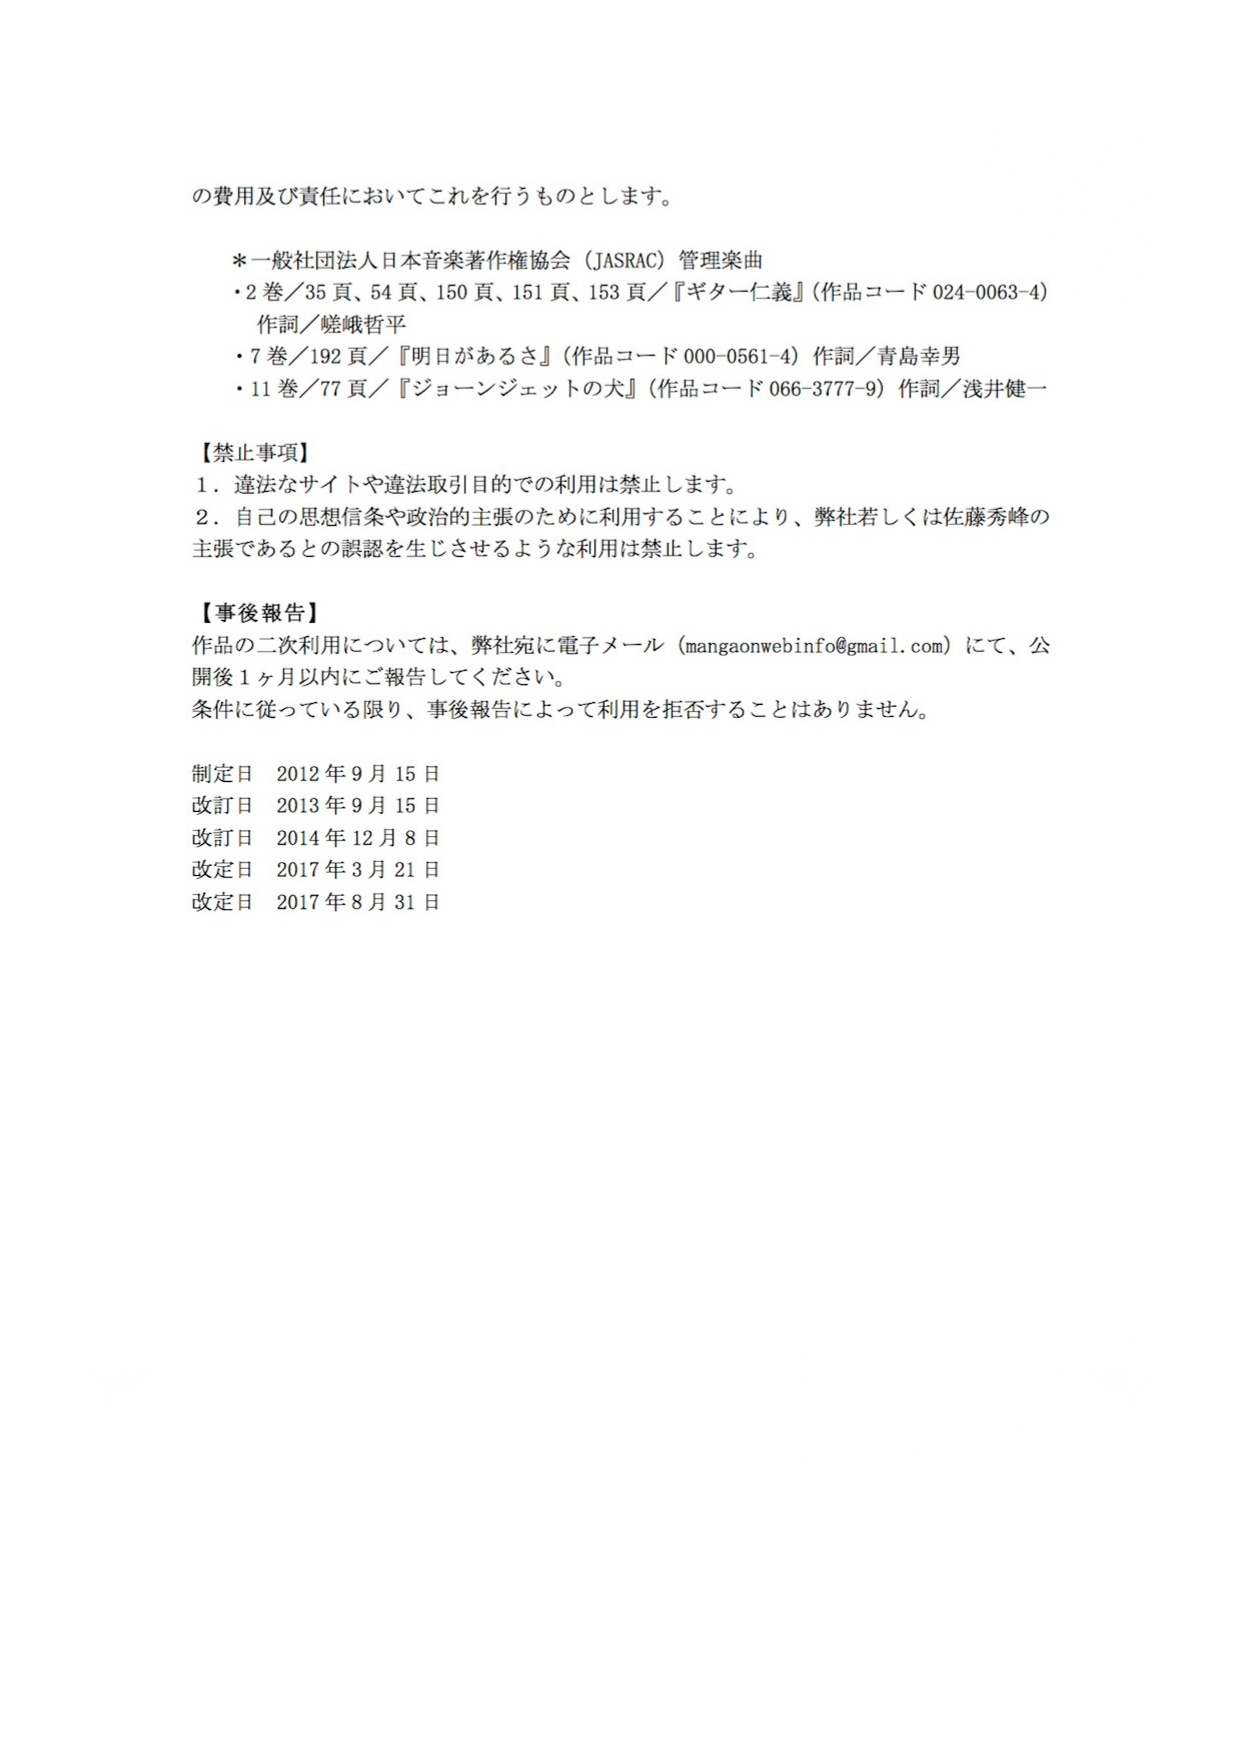 001bj_page-0211.jpg